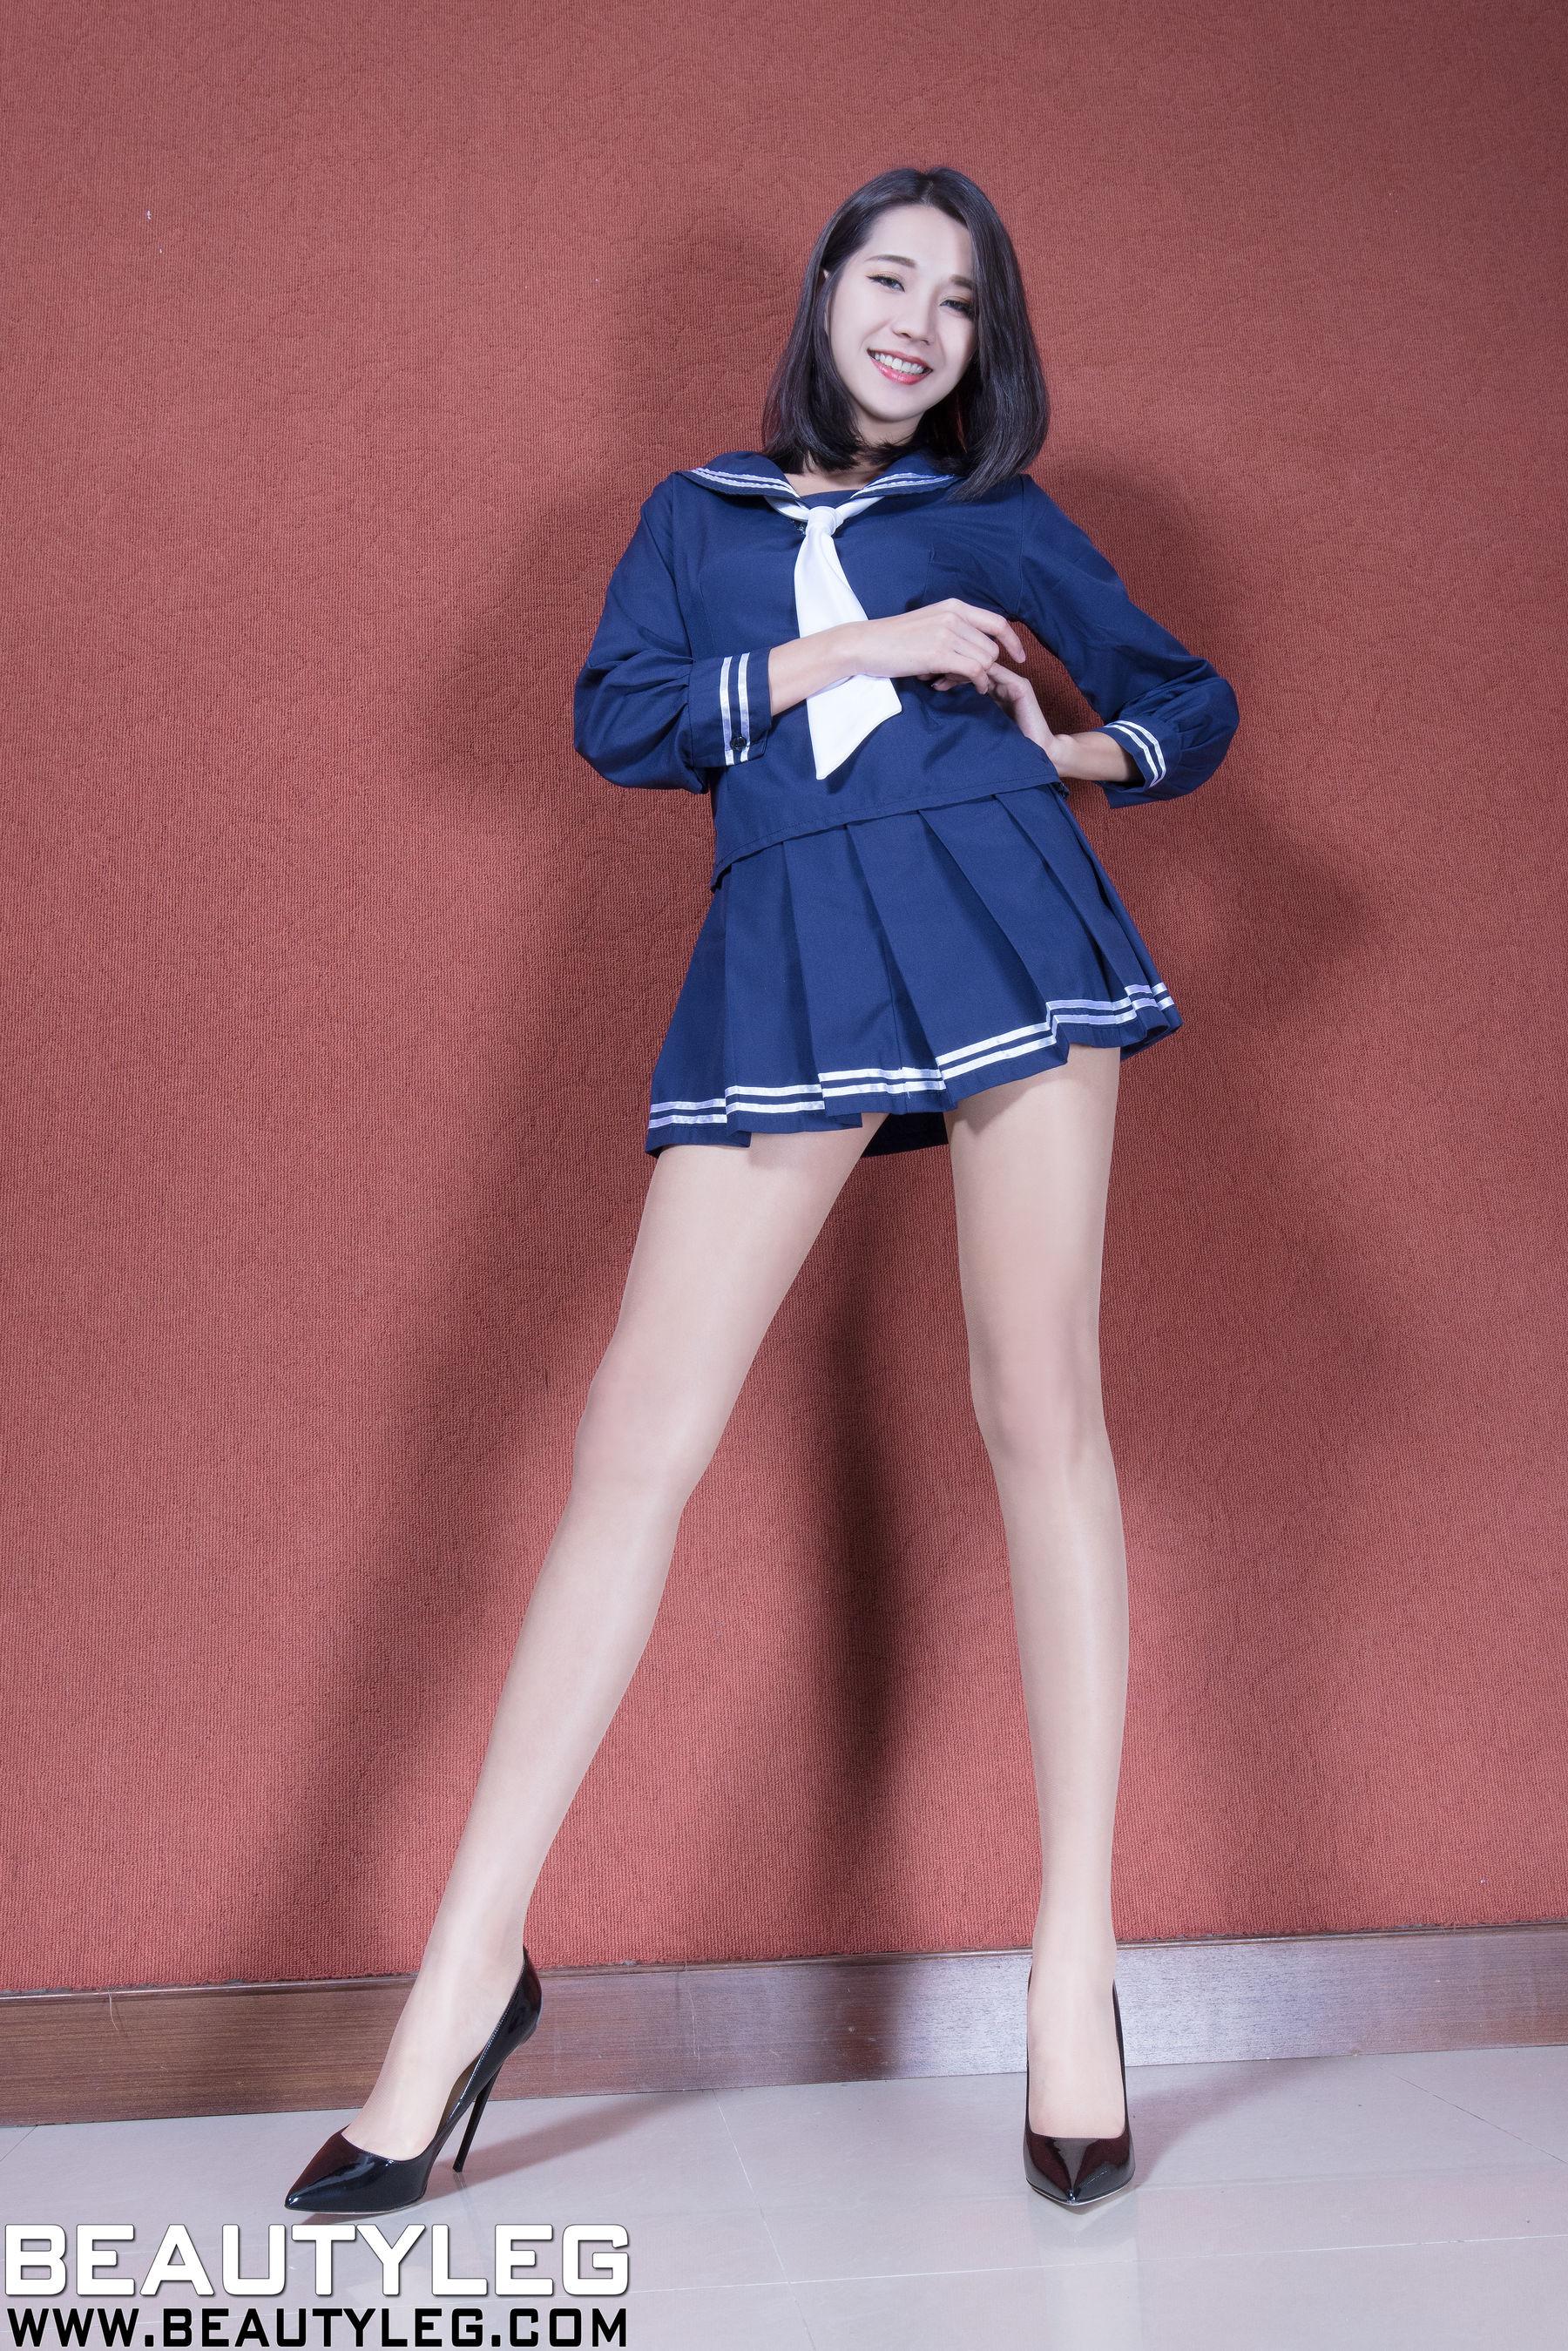 VOL.1273 [Beautyleg]制服长腿美女:林千如(腿模Anita)超高清个人性感漂亮大图(57P)